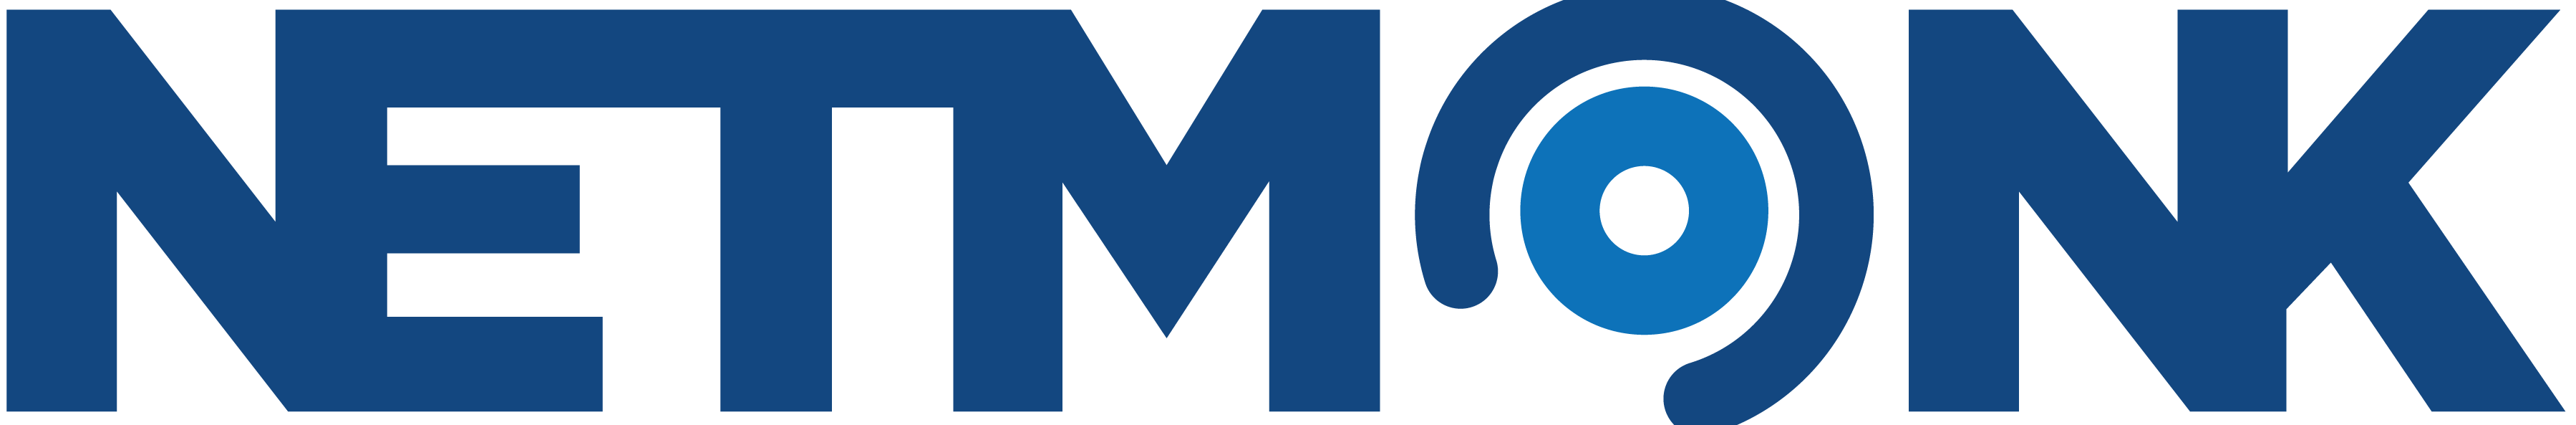 Netmonk Logo Icon